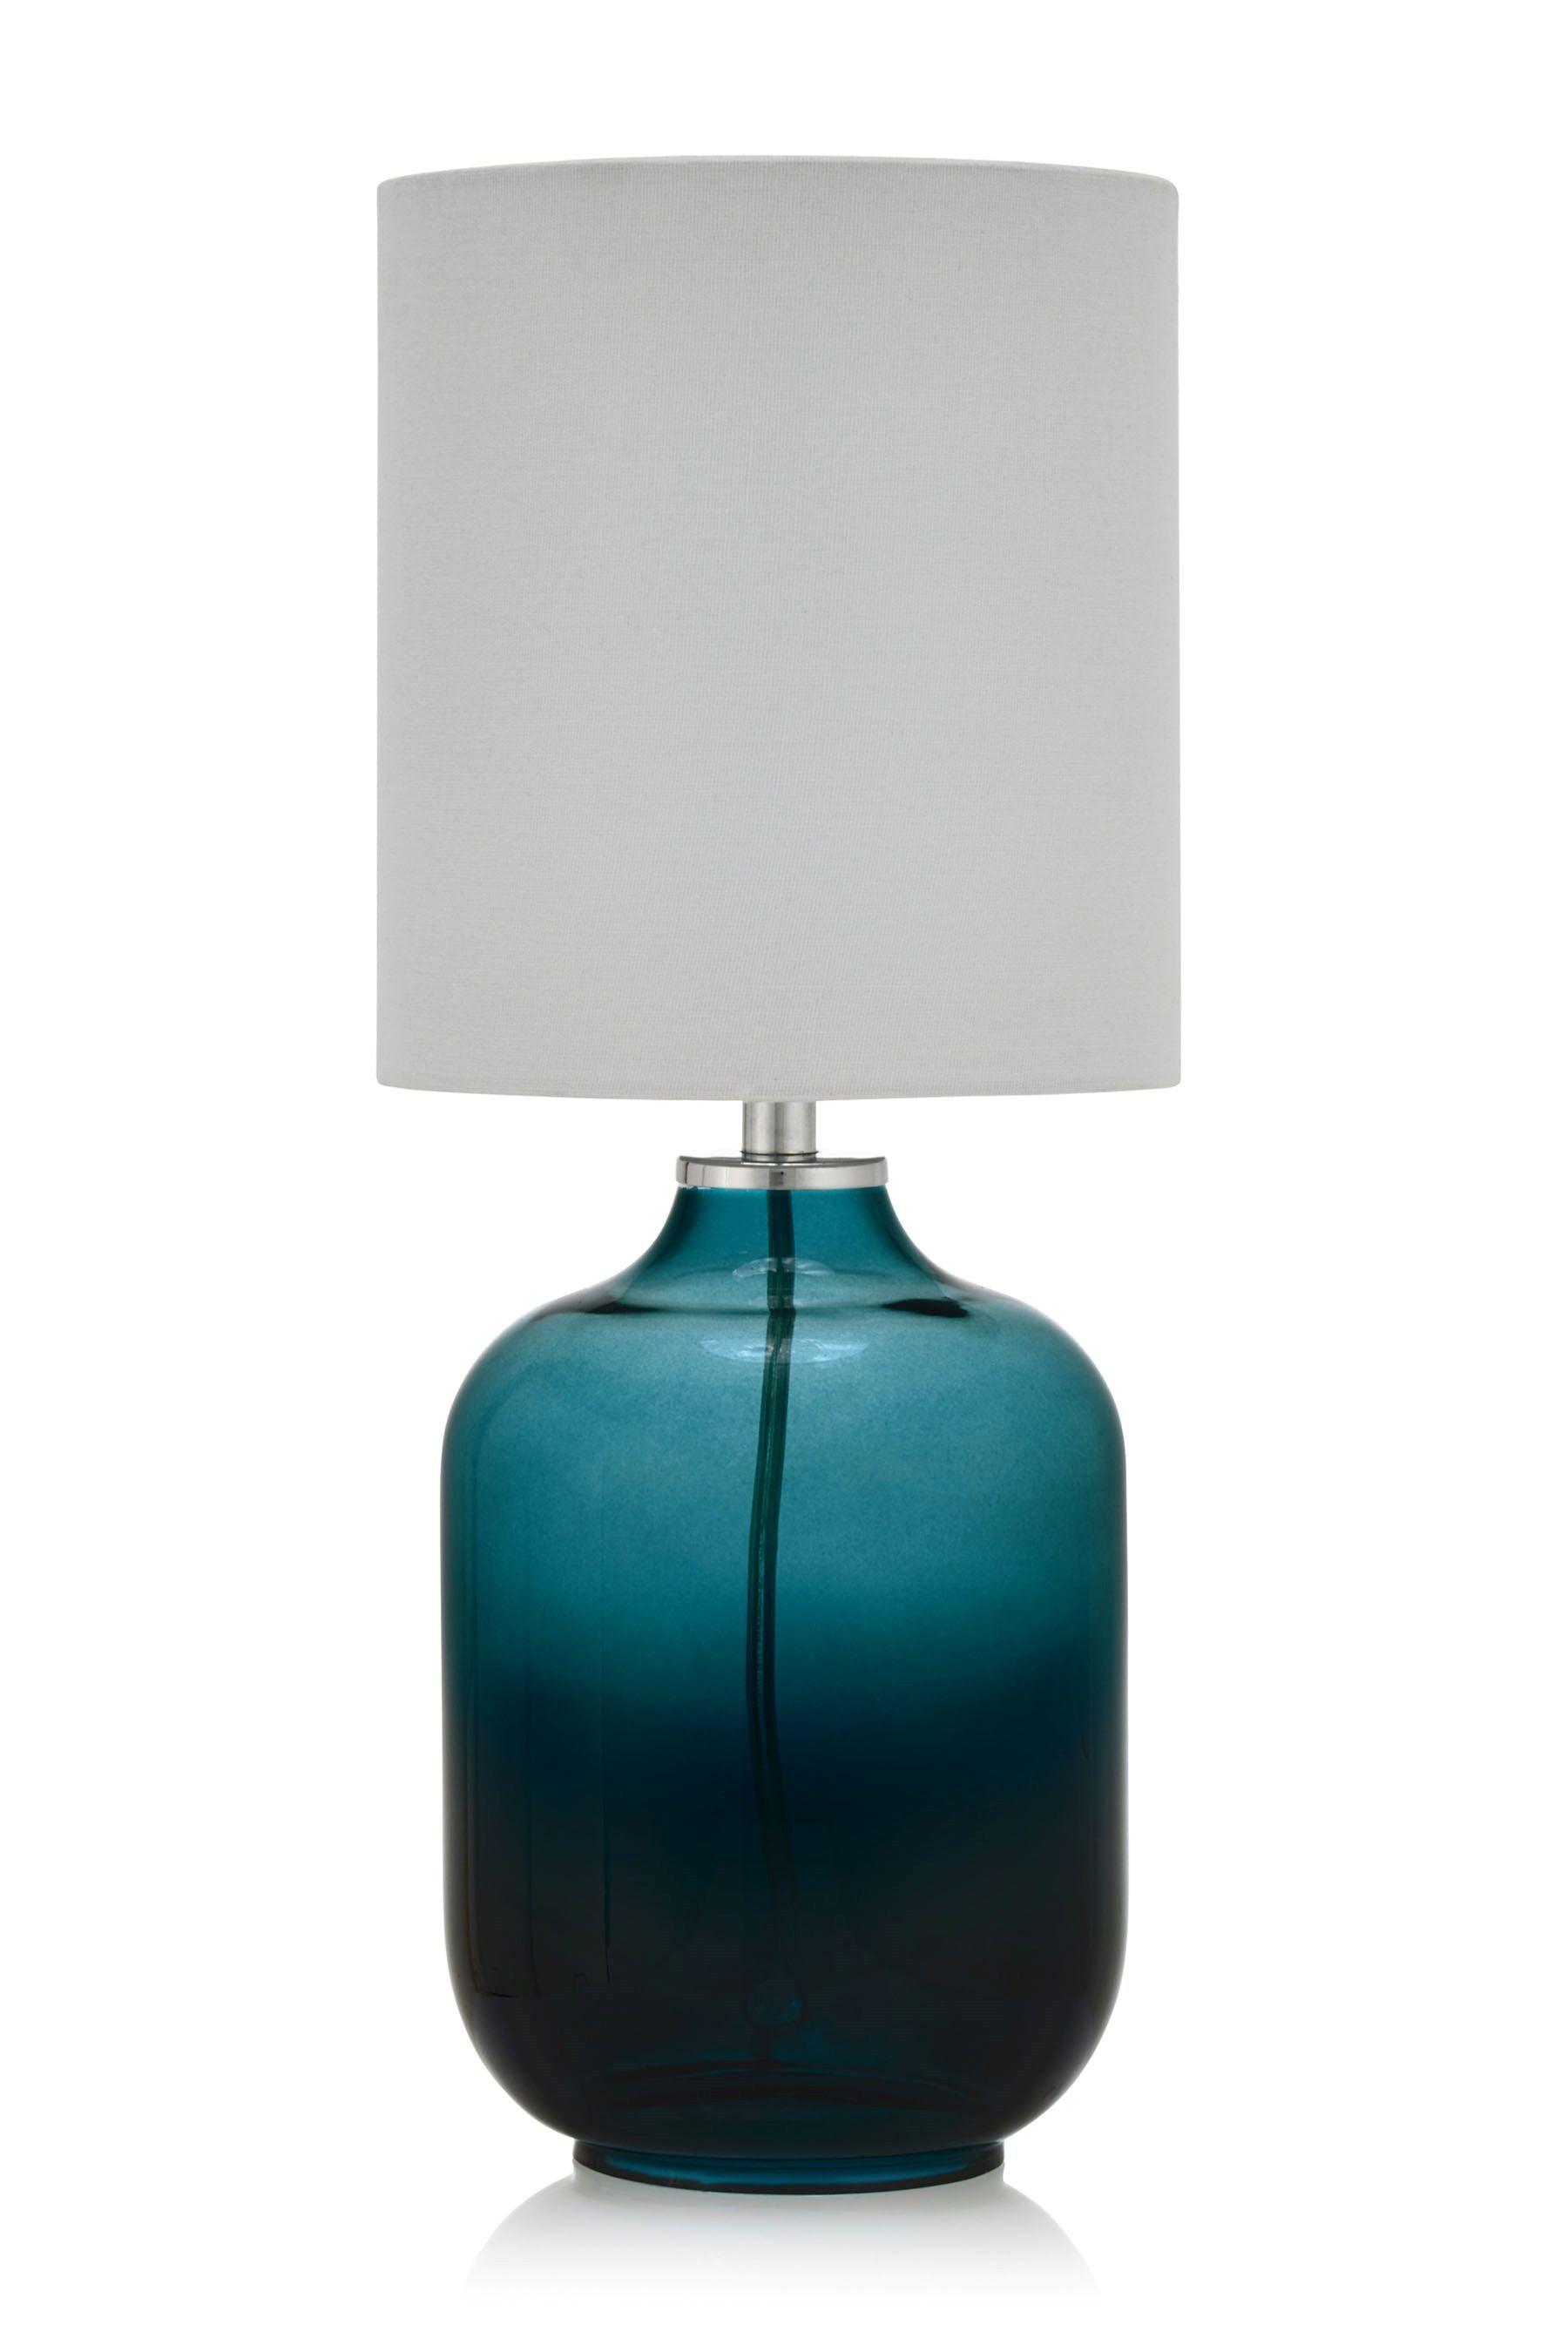 aqua lamps blue oregonuforeview tags teal com l table lamp